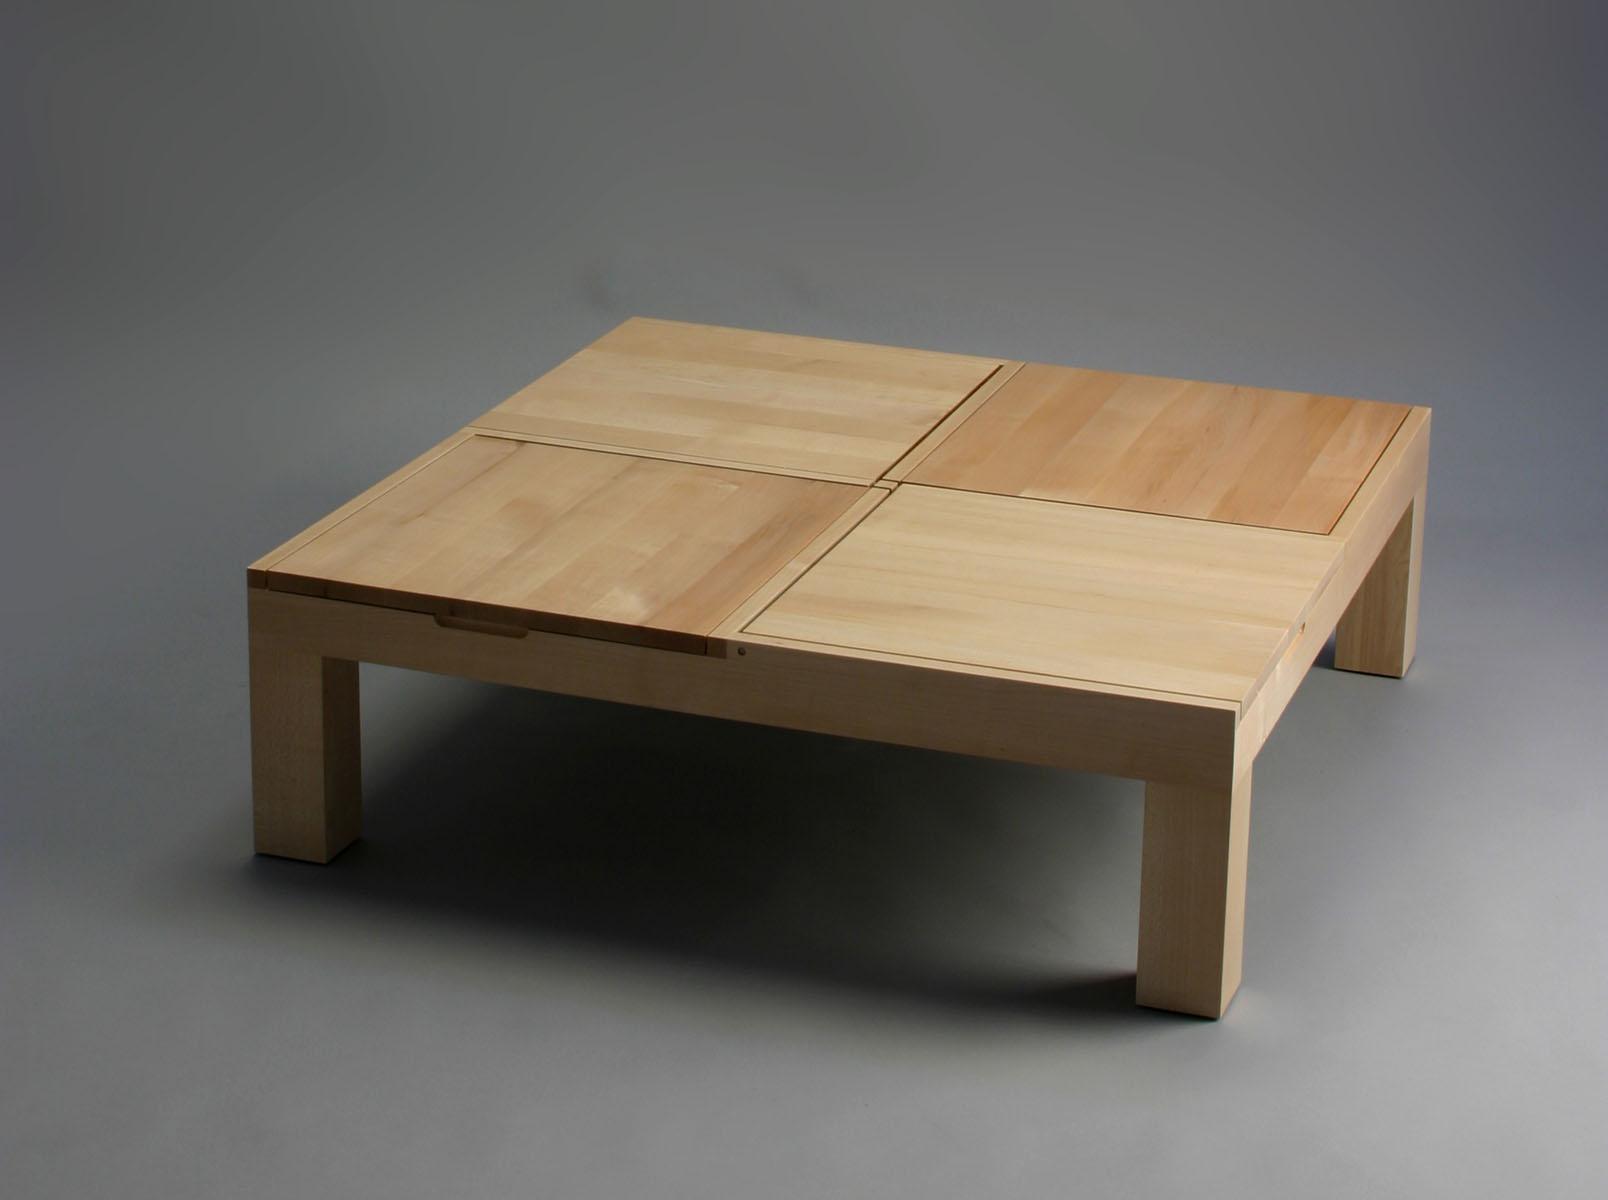 coffe-table combination